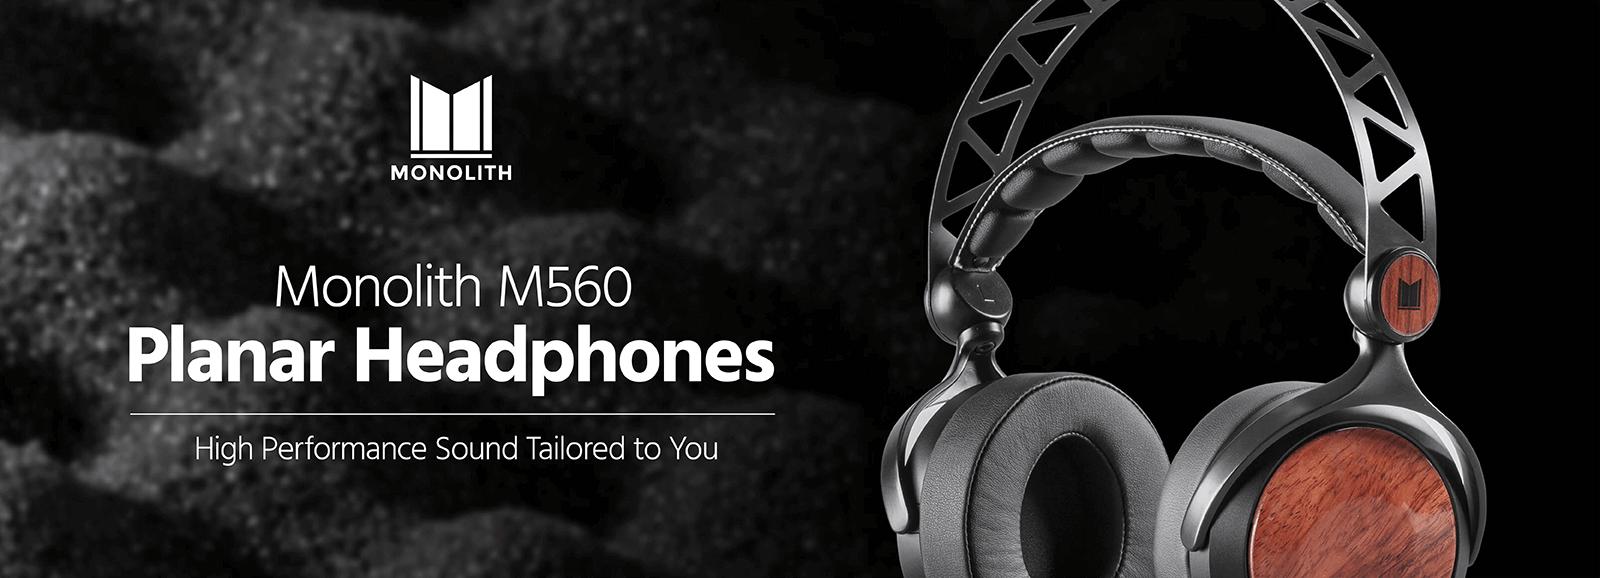 Monolith M560 Planar Headphones